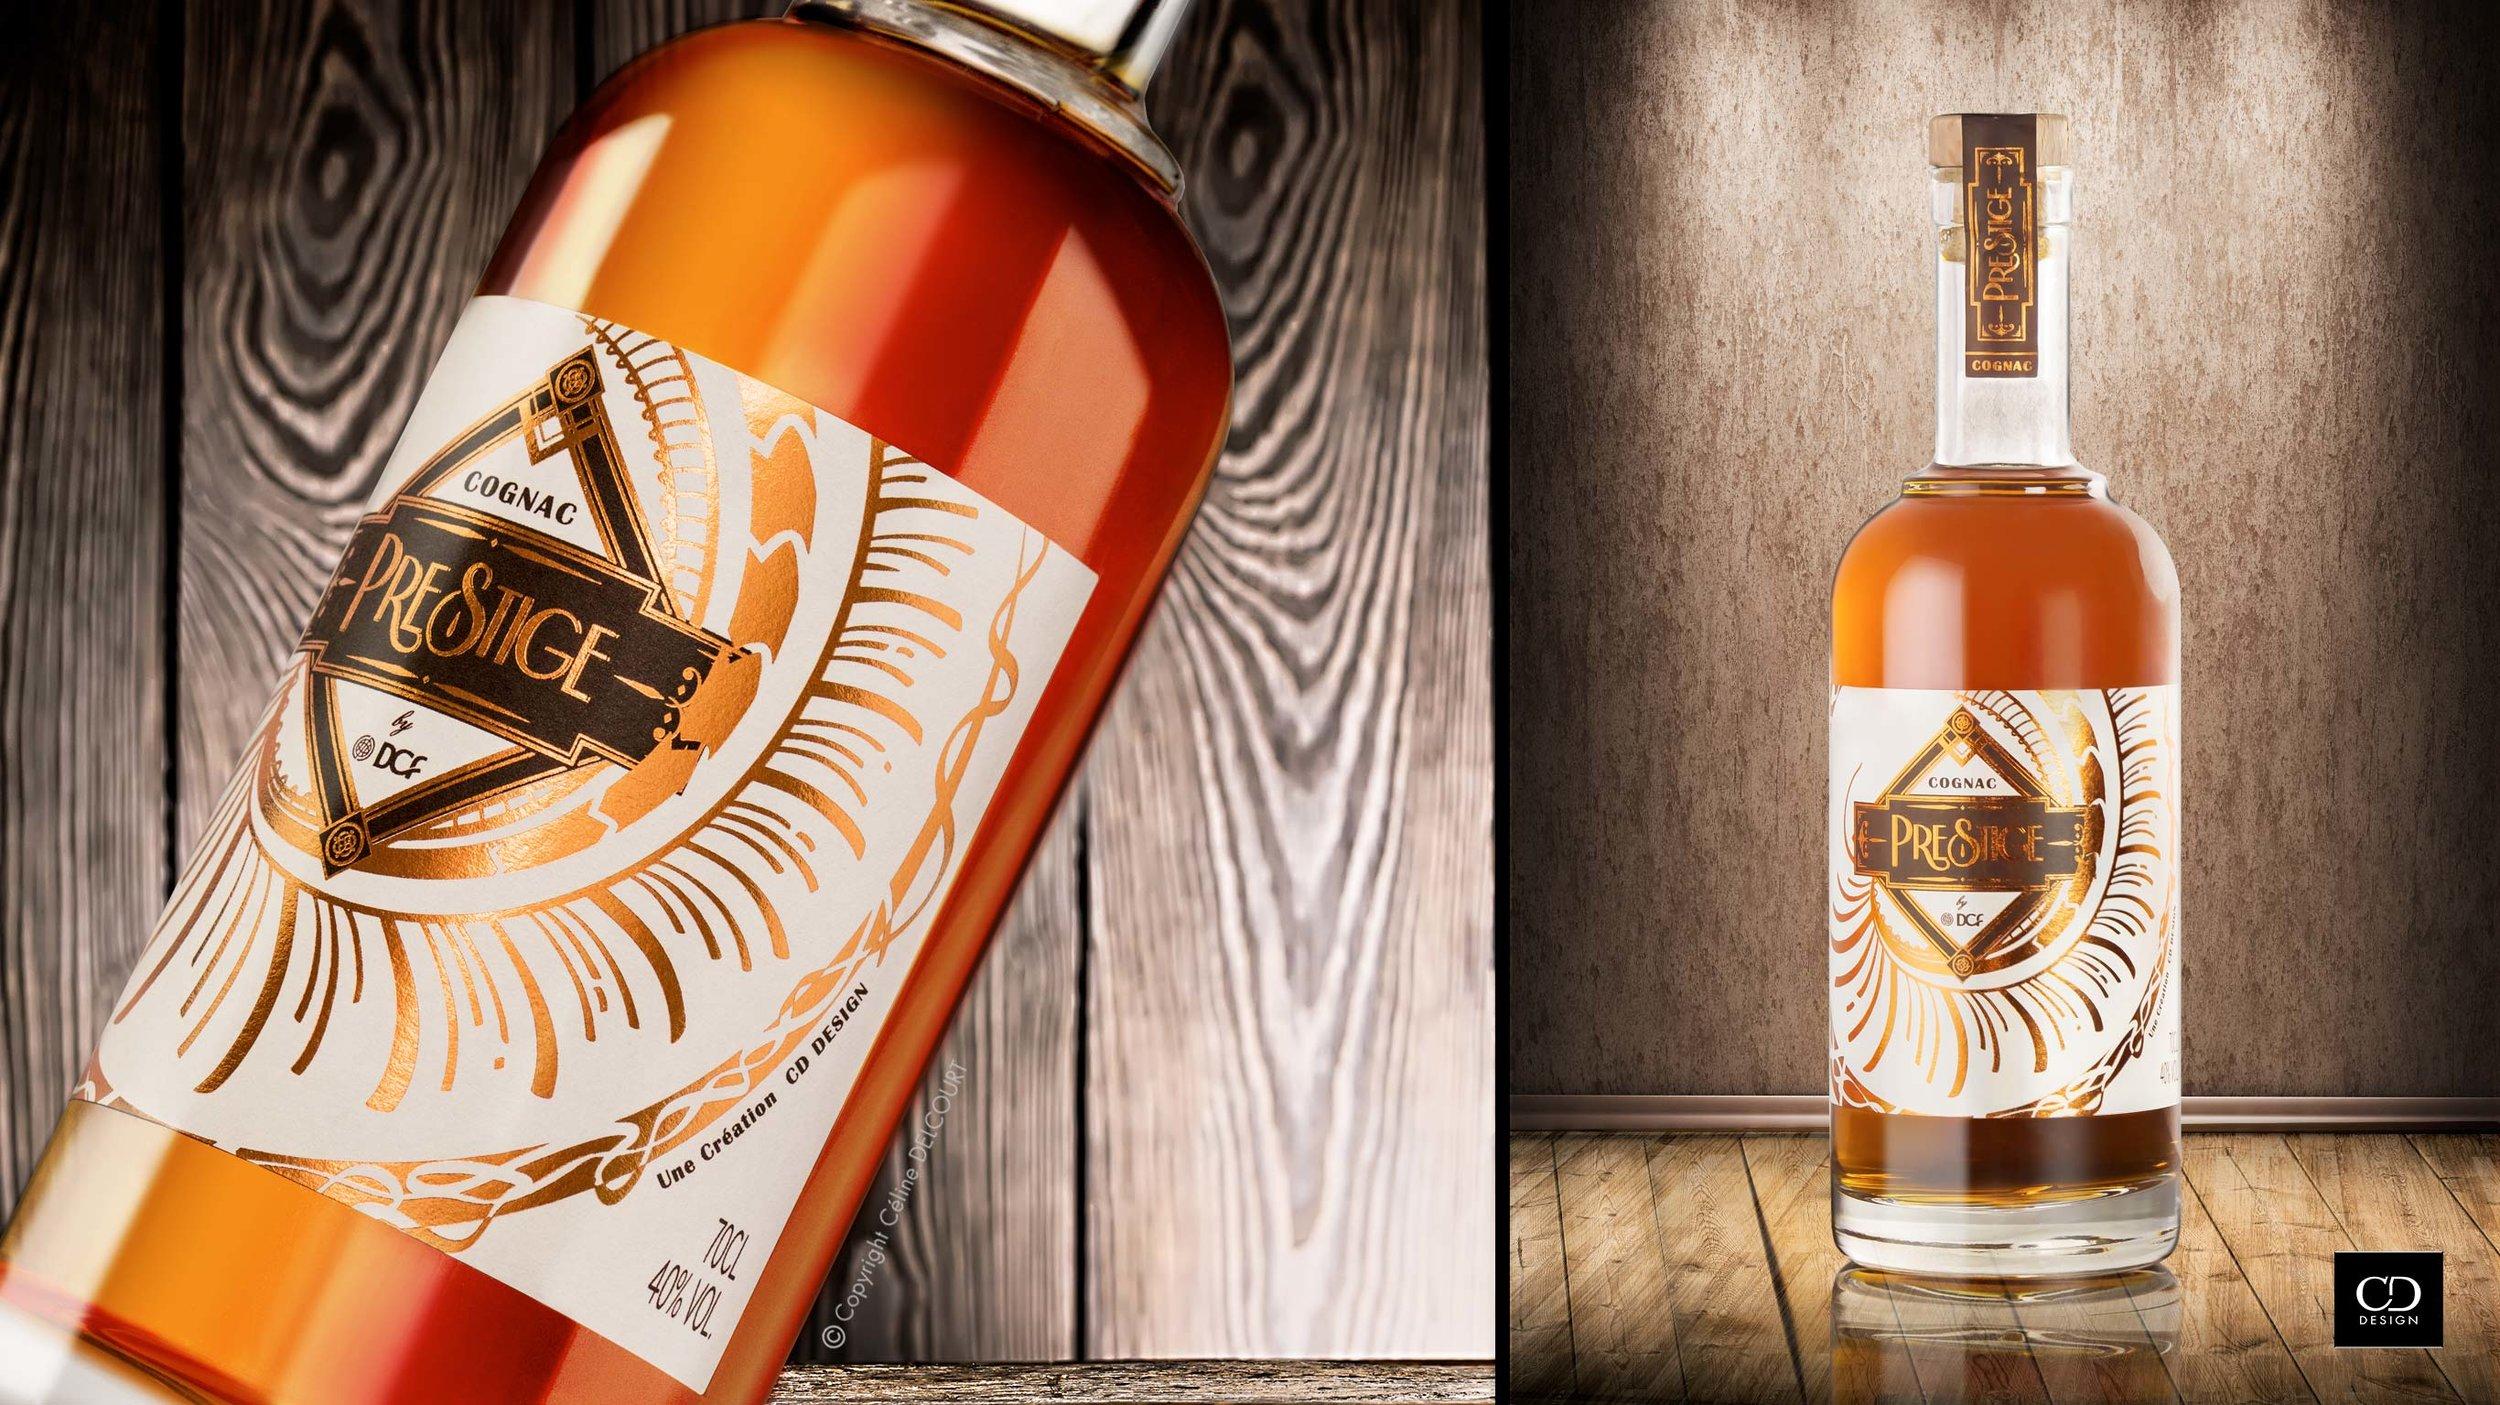 CDDESIGN.Prestige.Cognac.jpg